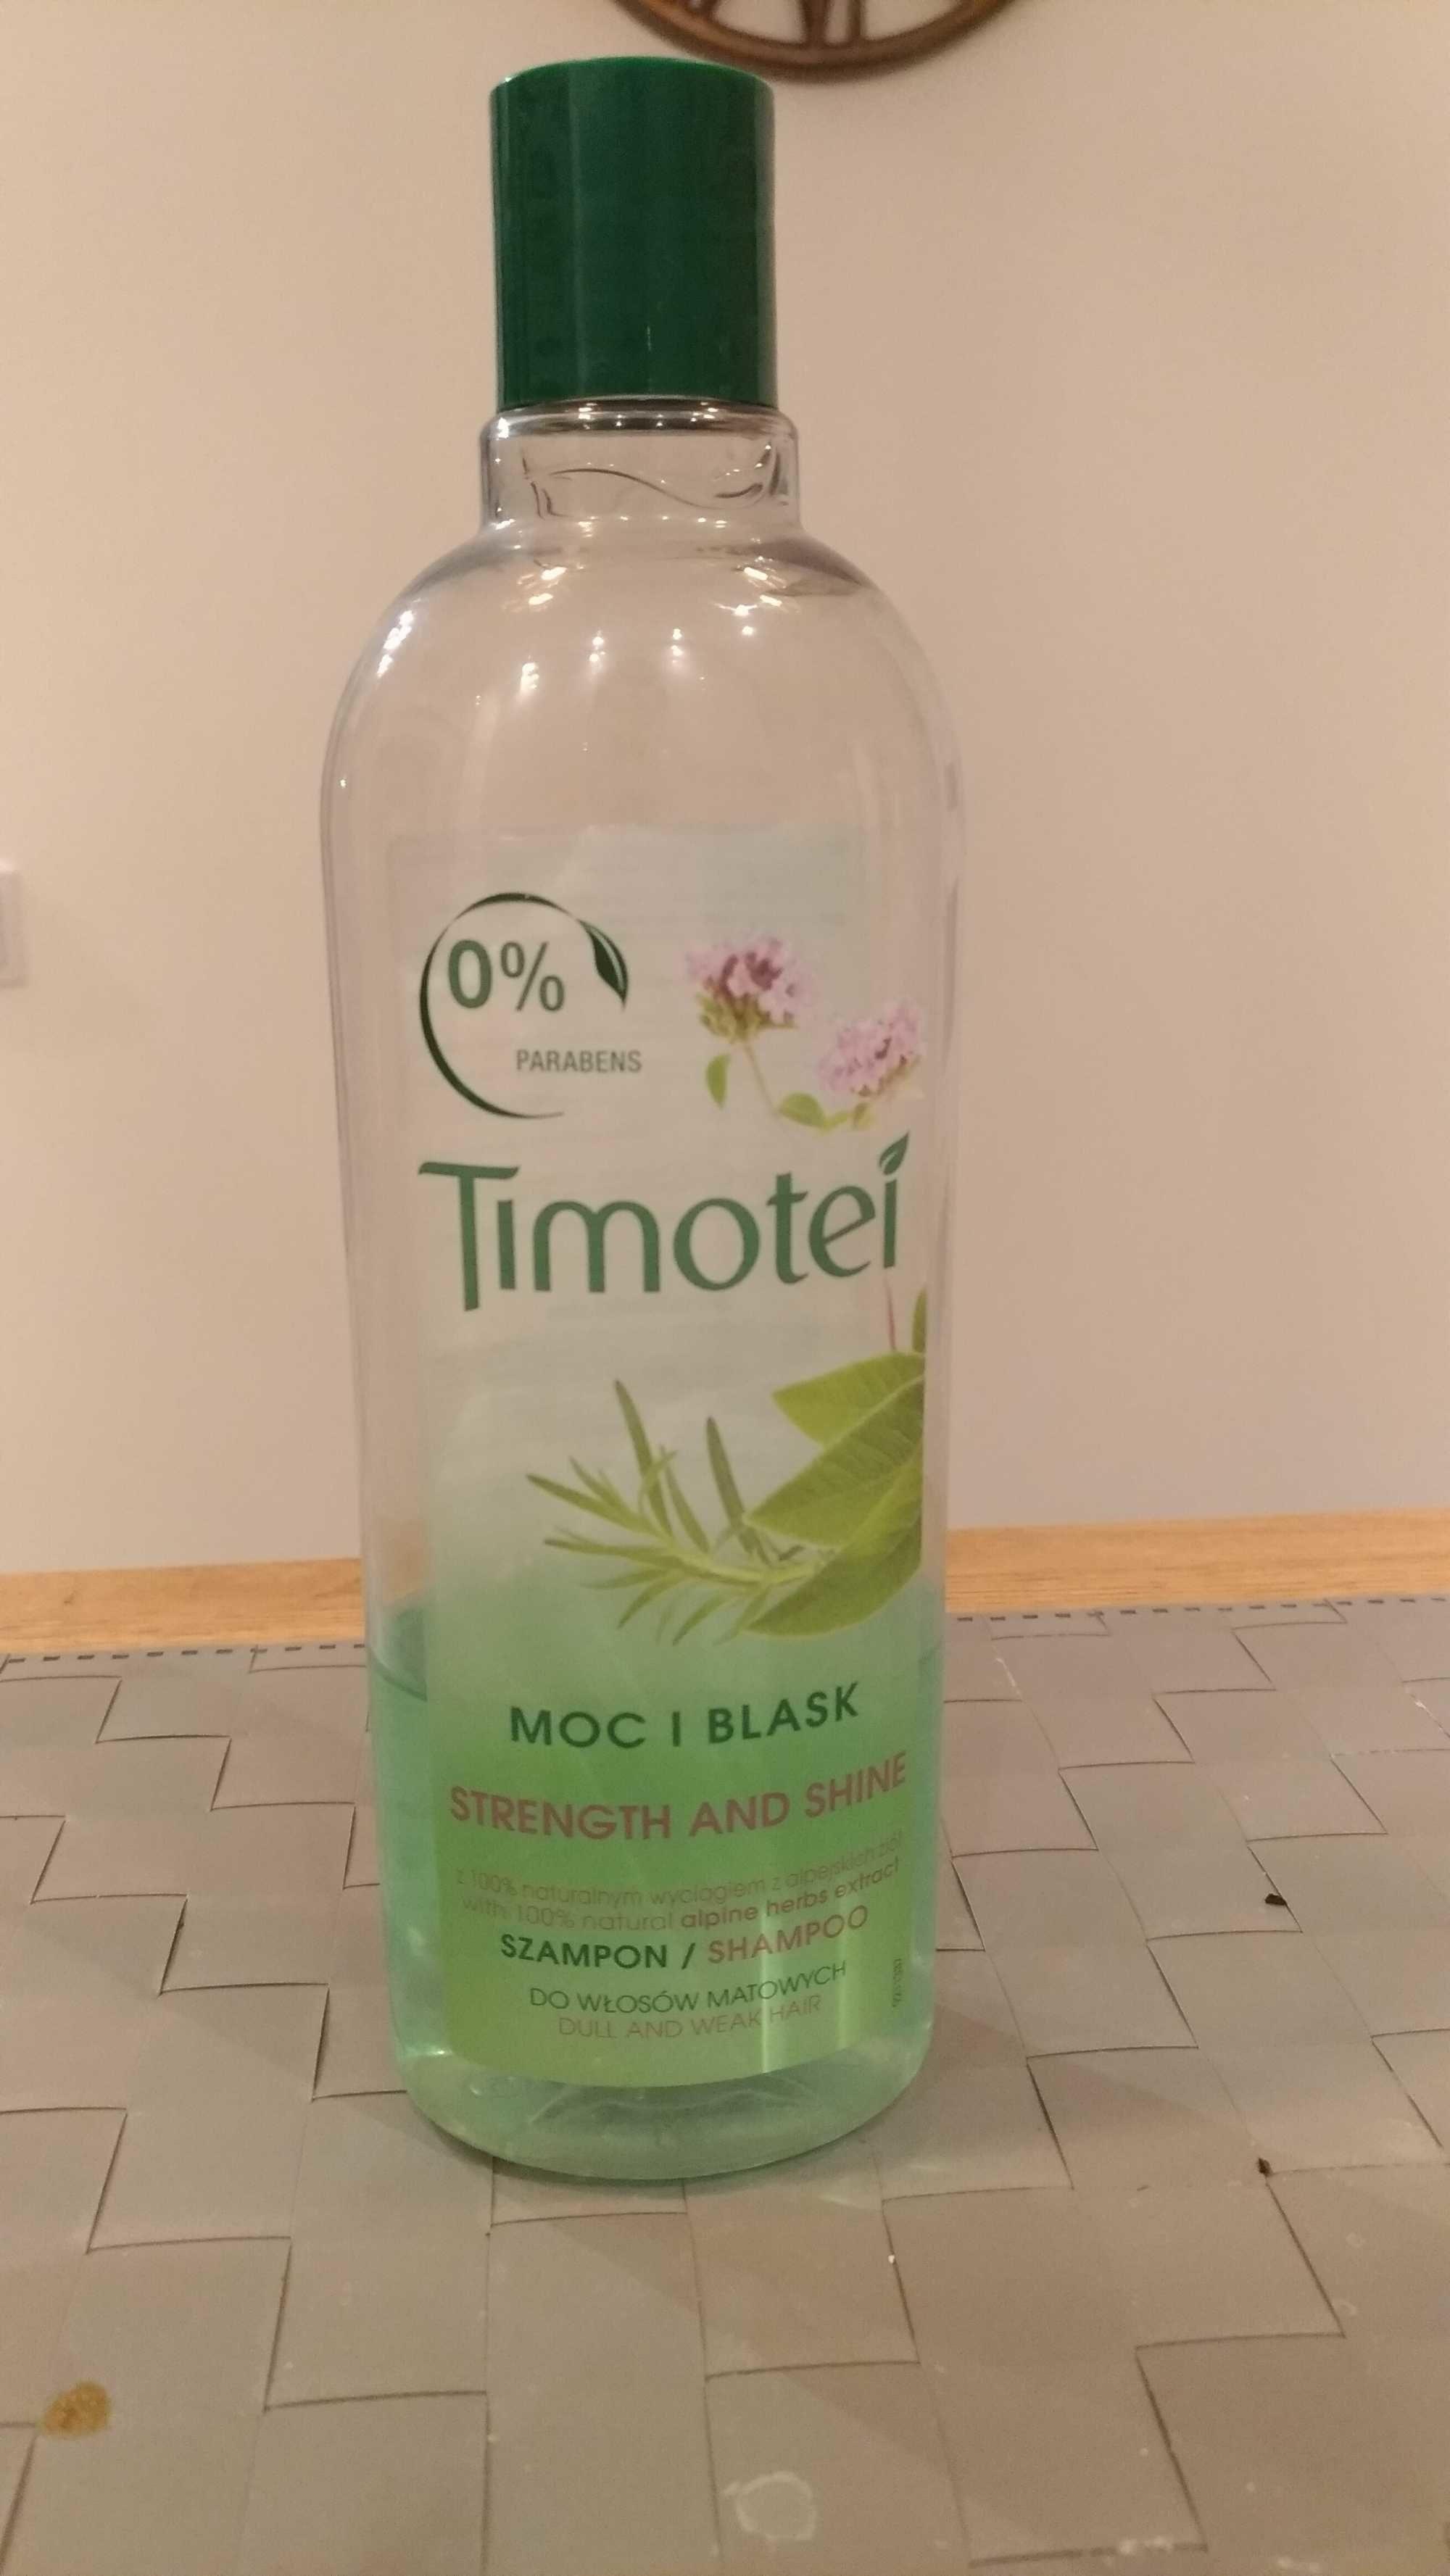 Timoteo Mochila I Blask - Product